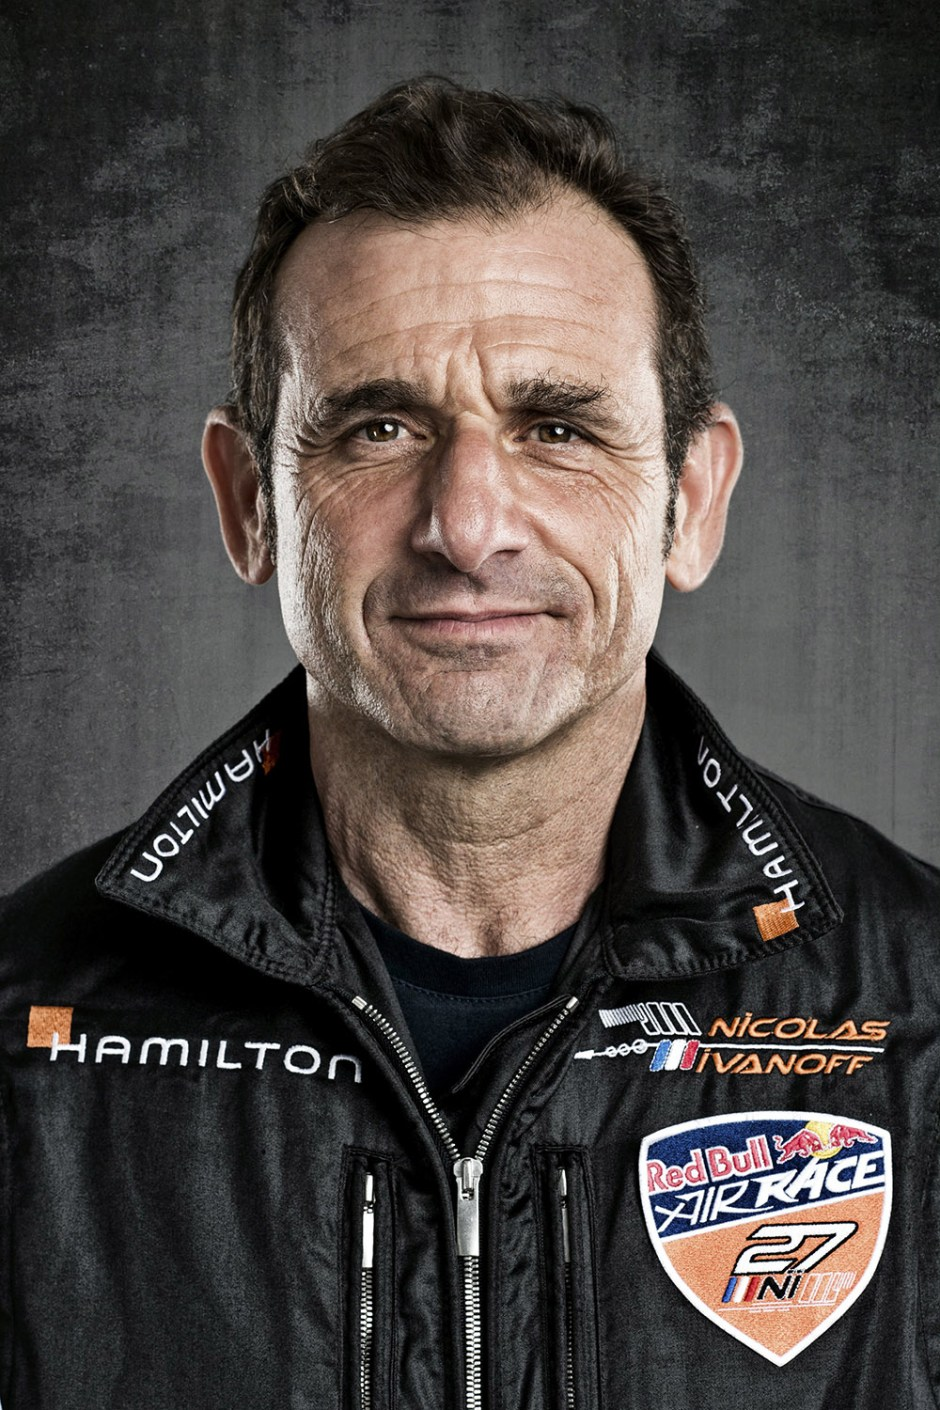 Nicolas Ivanoff